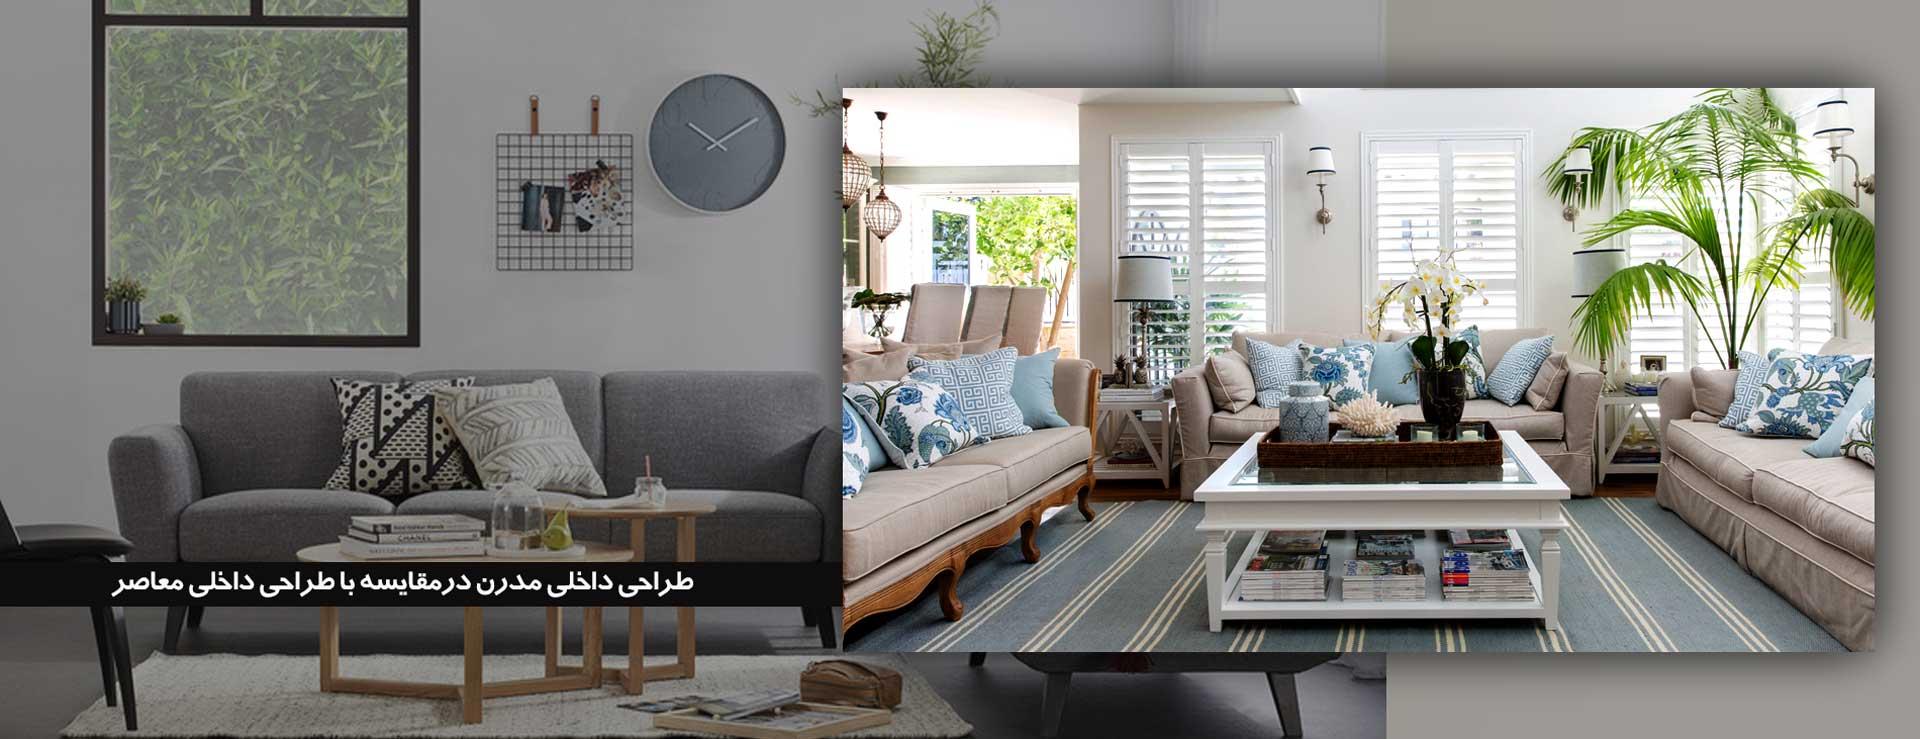 design 1 - مقایسه طراحی داخلی مدرن با معاصر